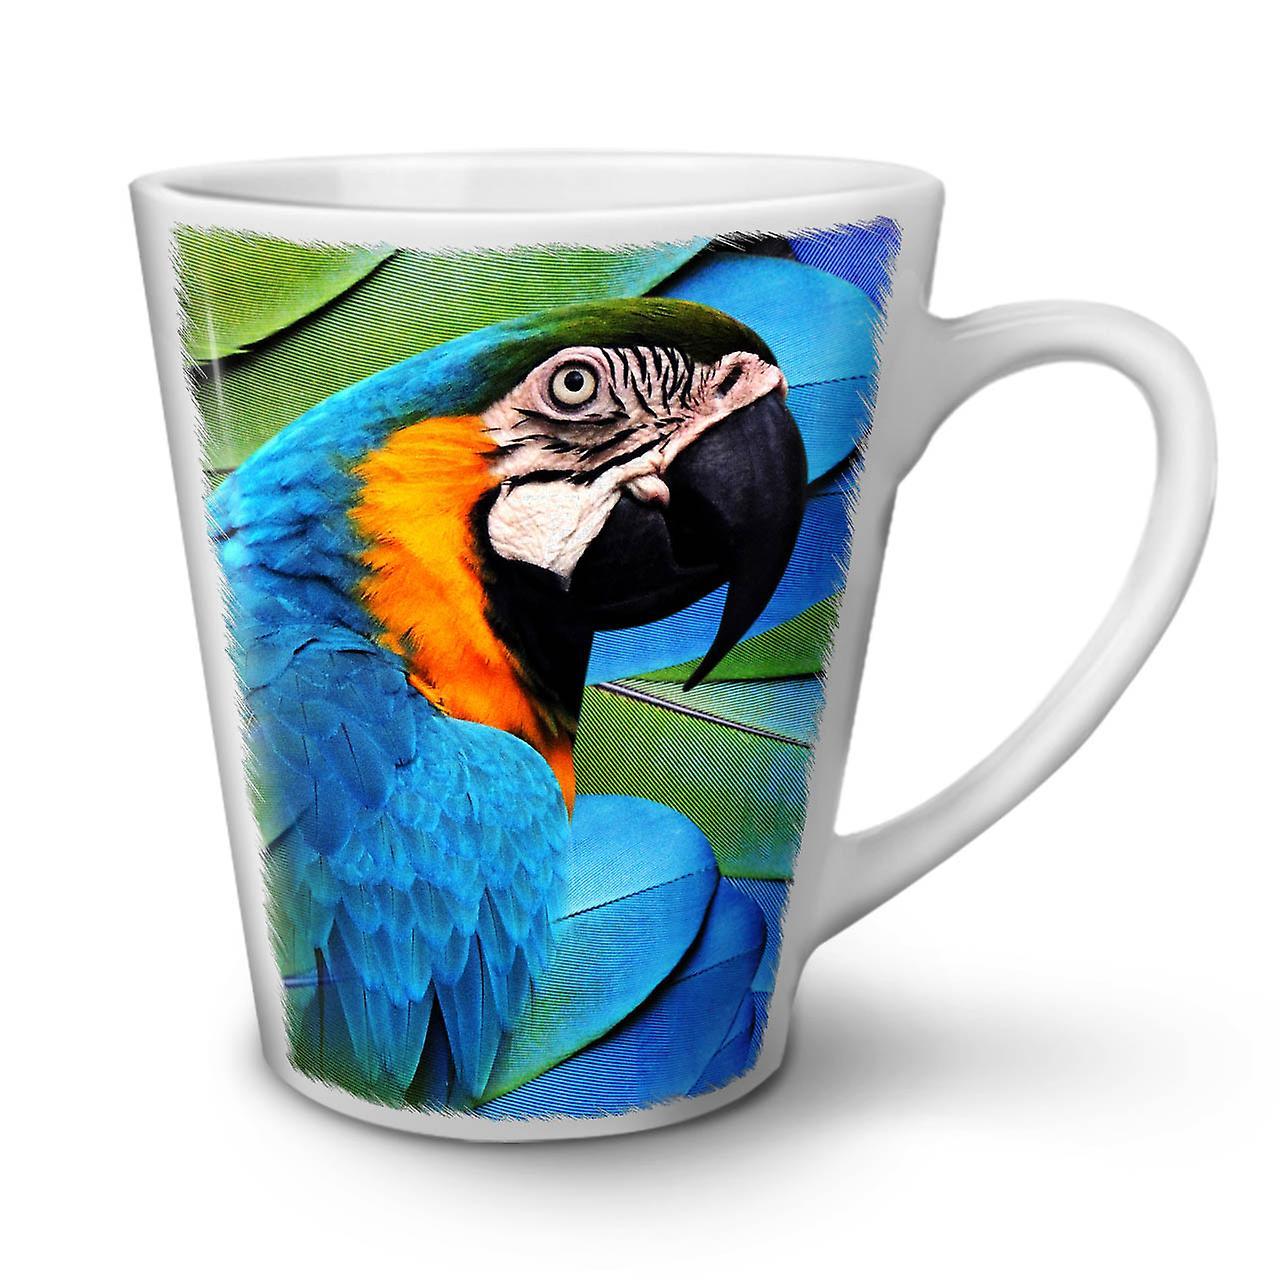 Mignon Nouveau Mug Perroquet Blanc En OzWellcoda Céramique Thé 12 Latte Oiseaux Café 6Ybyvf7g